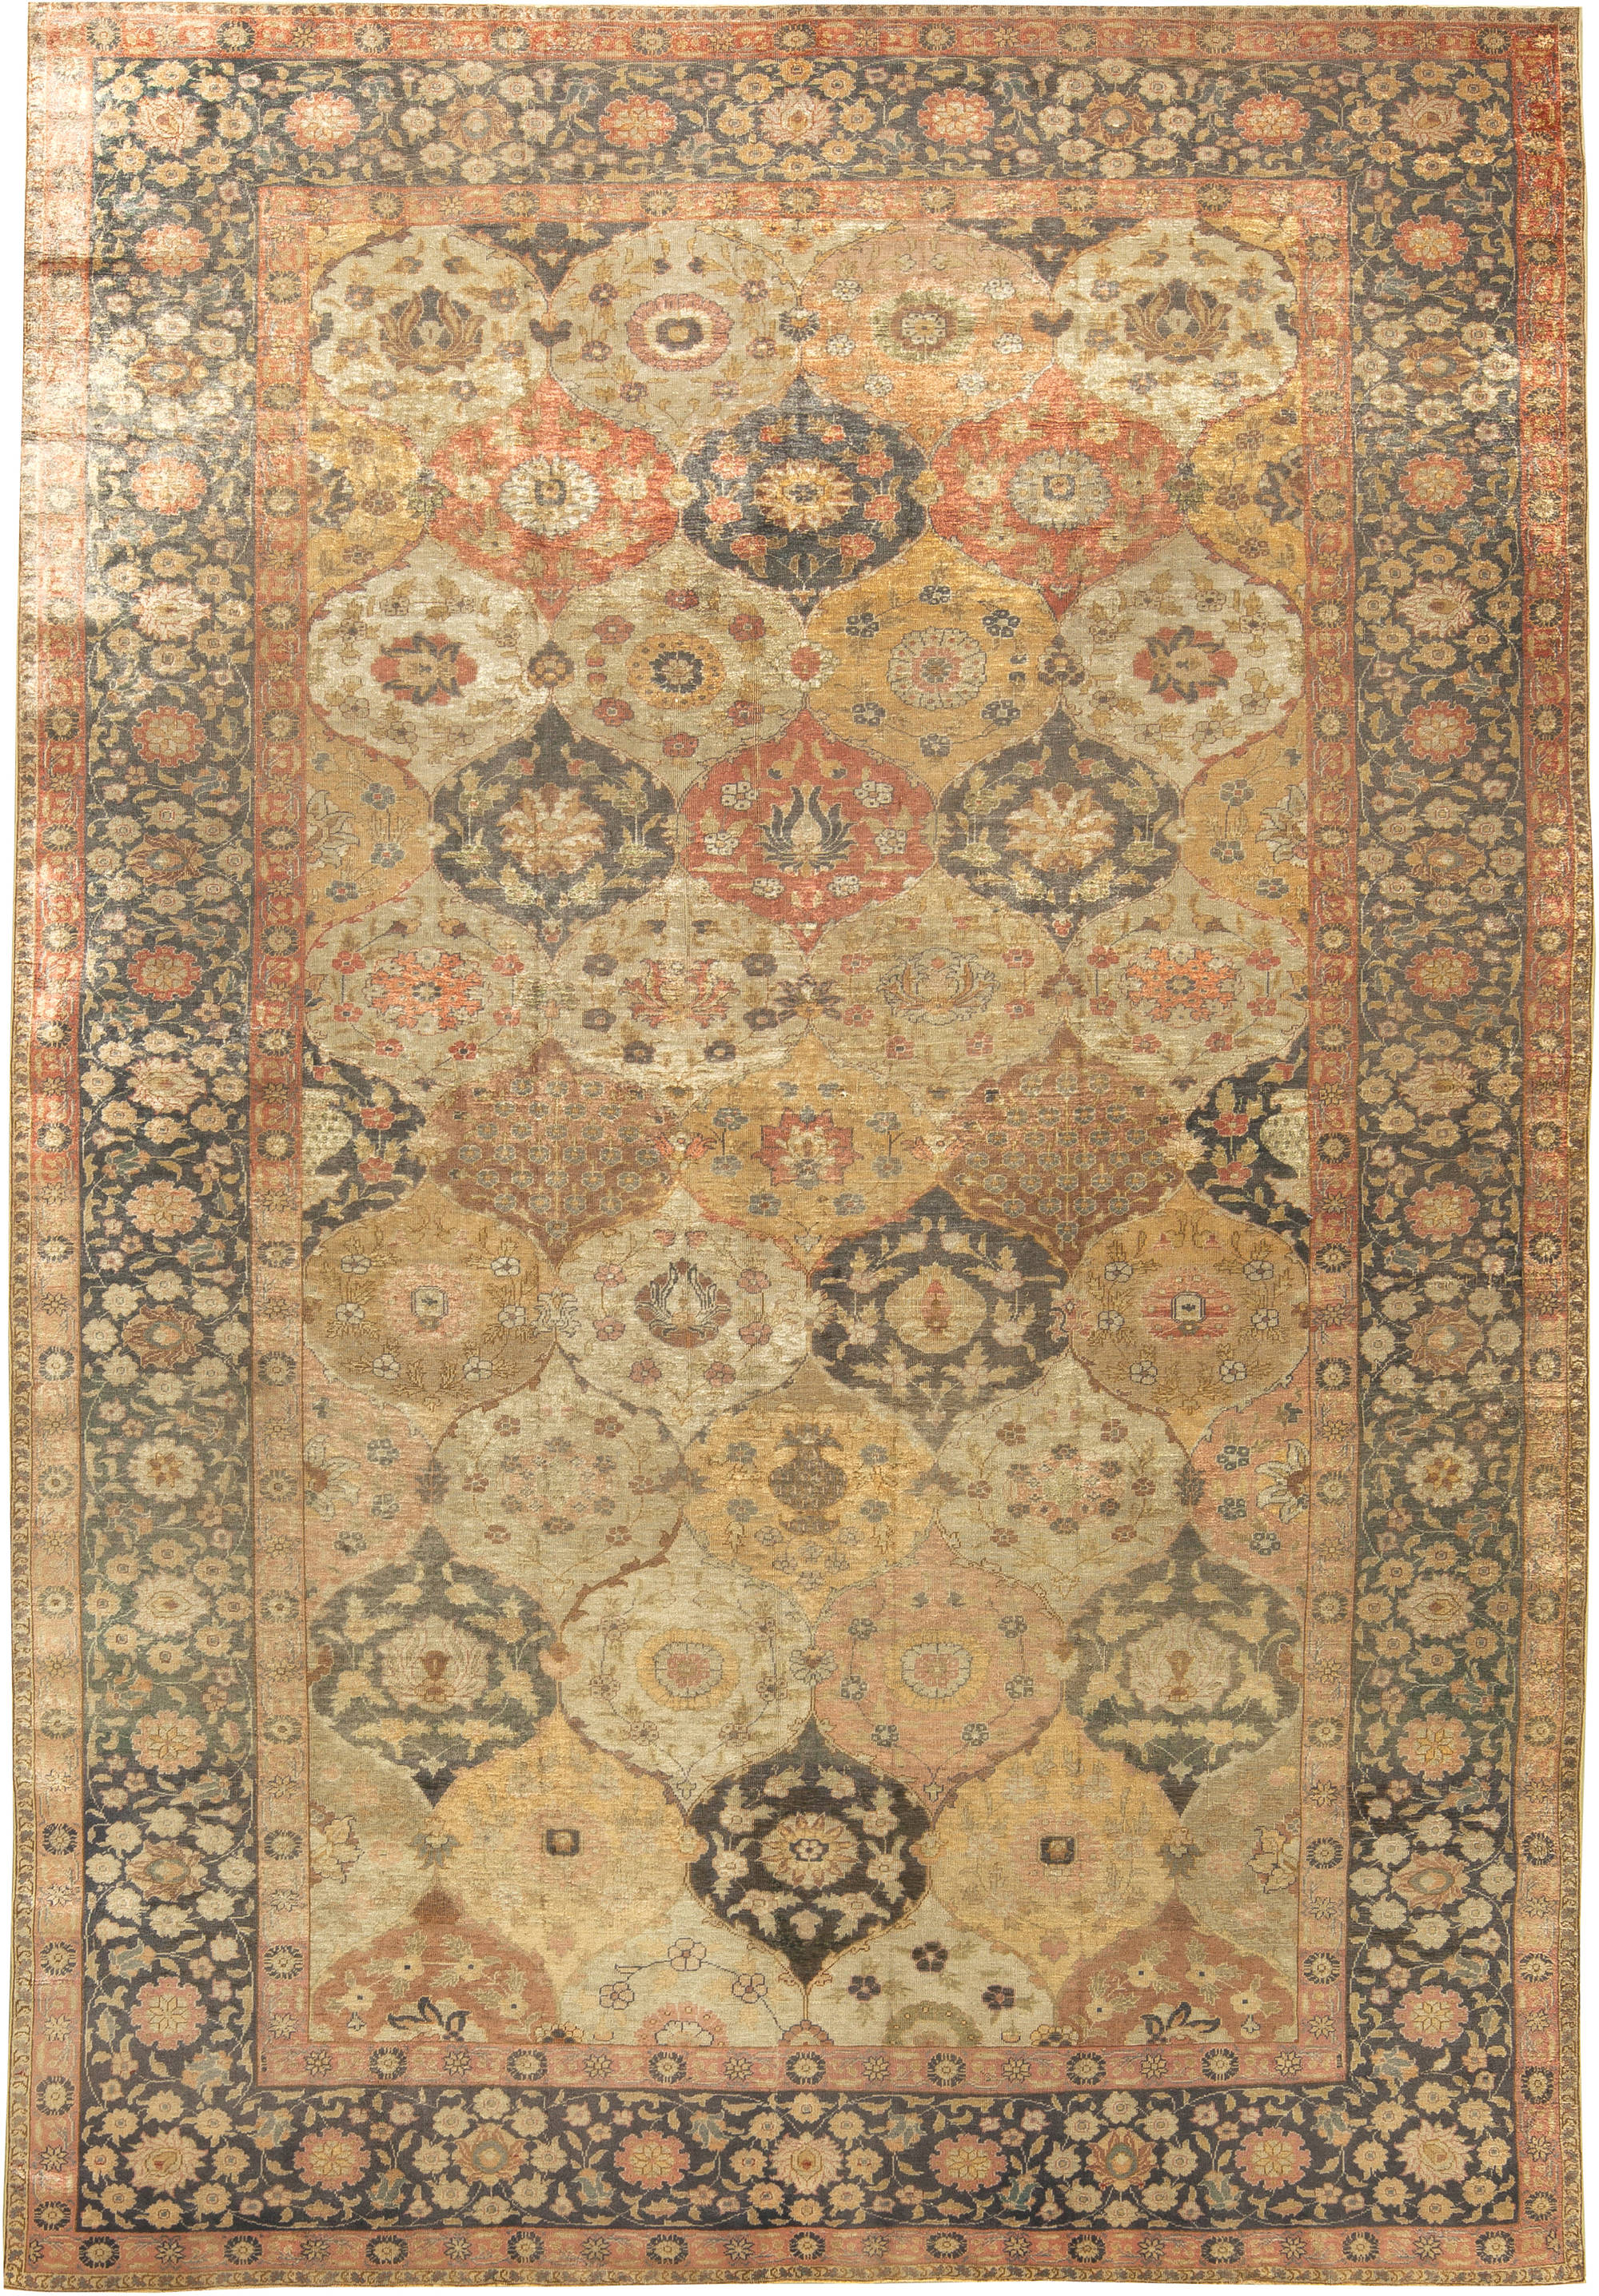 Antique Turkish Silk Hereke Rug BB6081